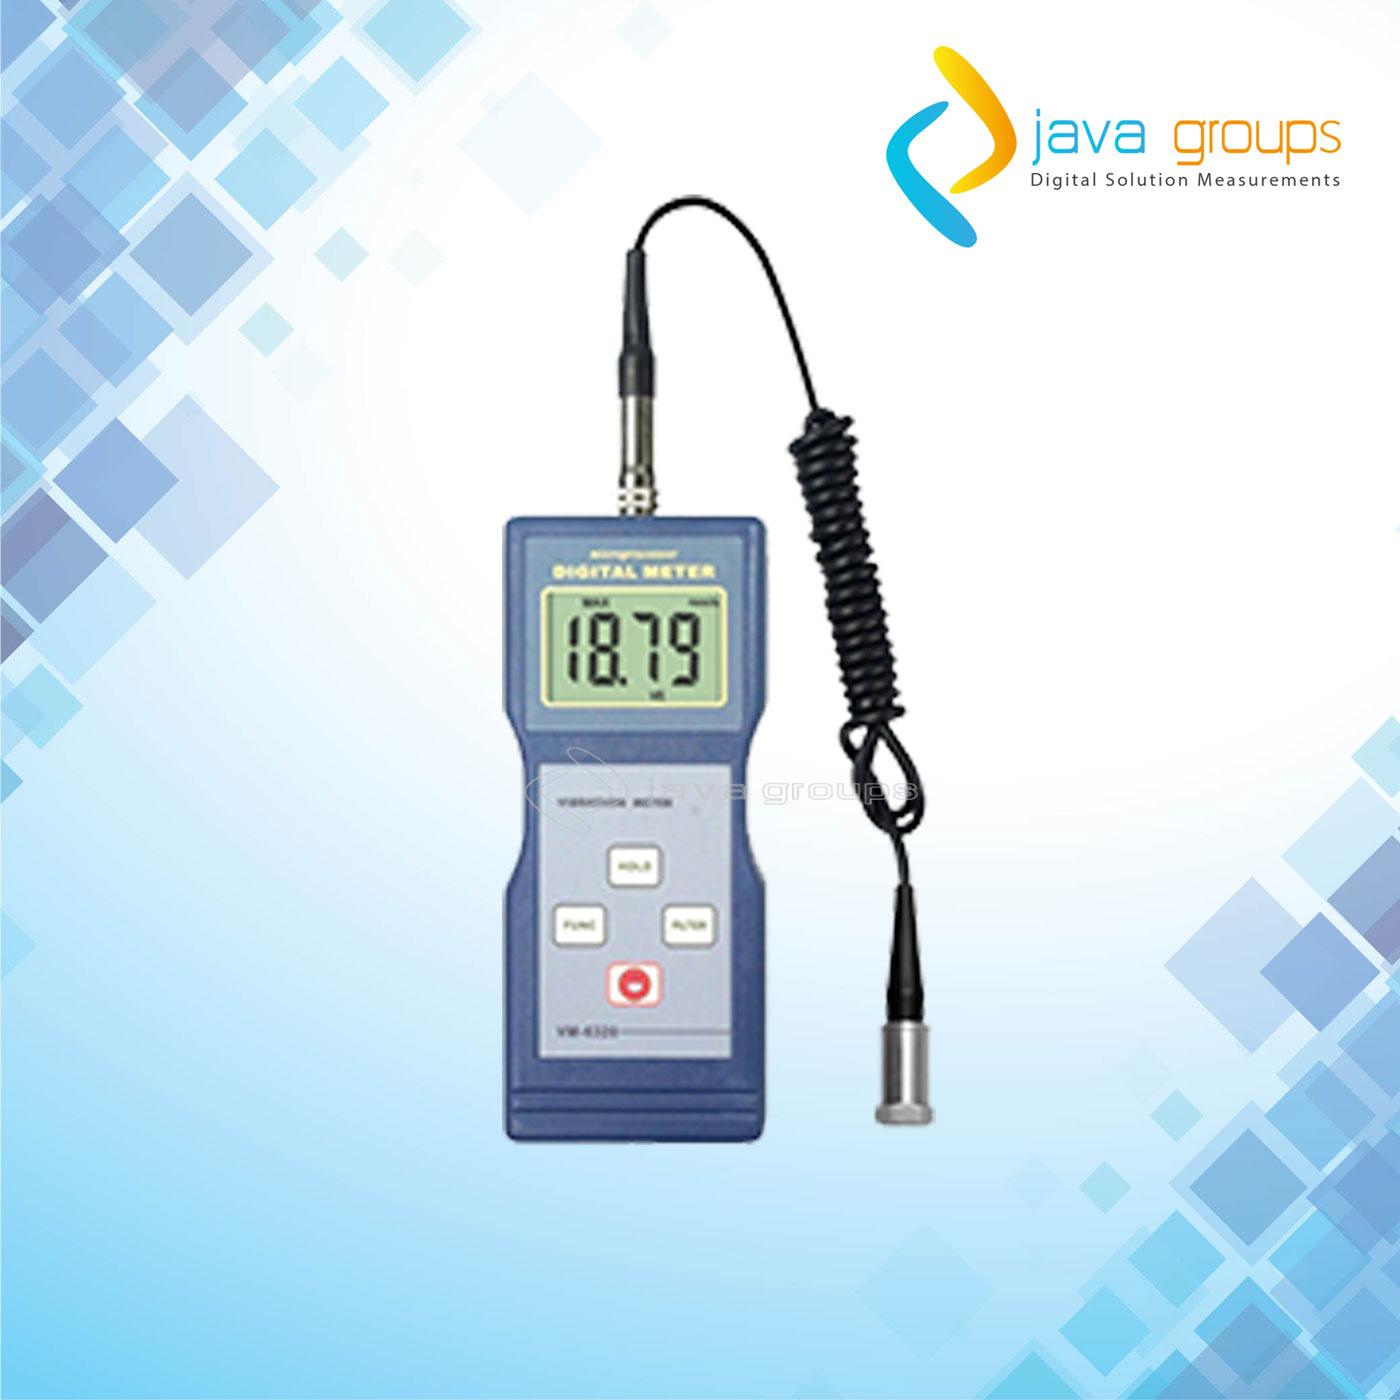 Alat Vibration Meter Pengukur Geteran Mesin VM-6310